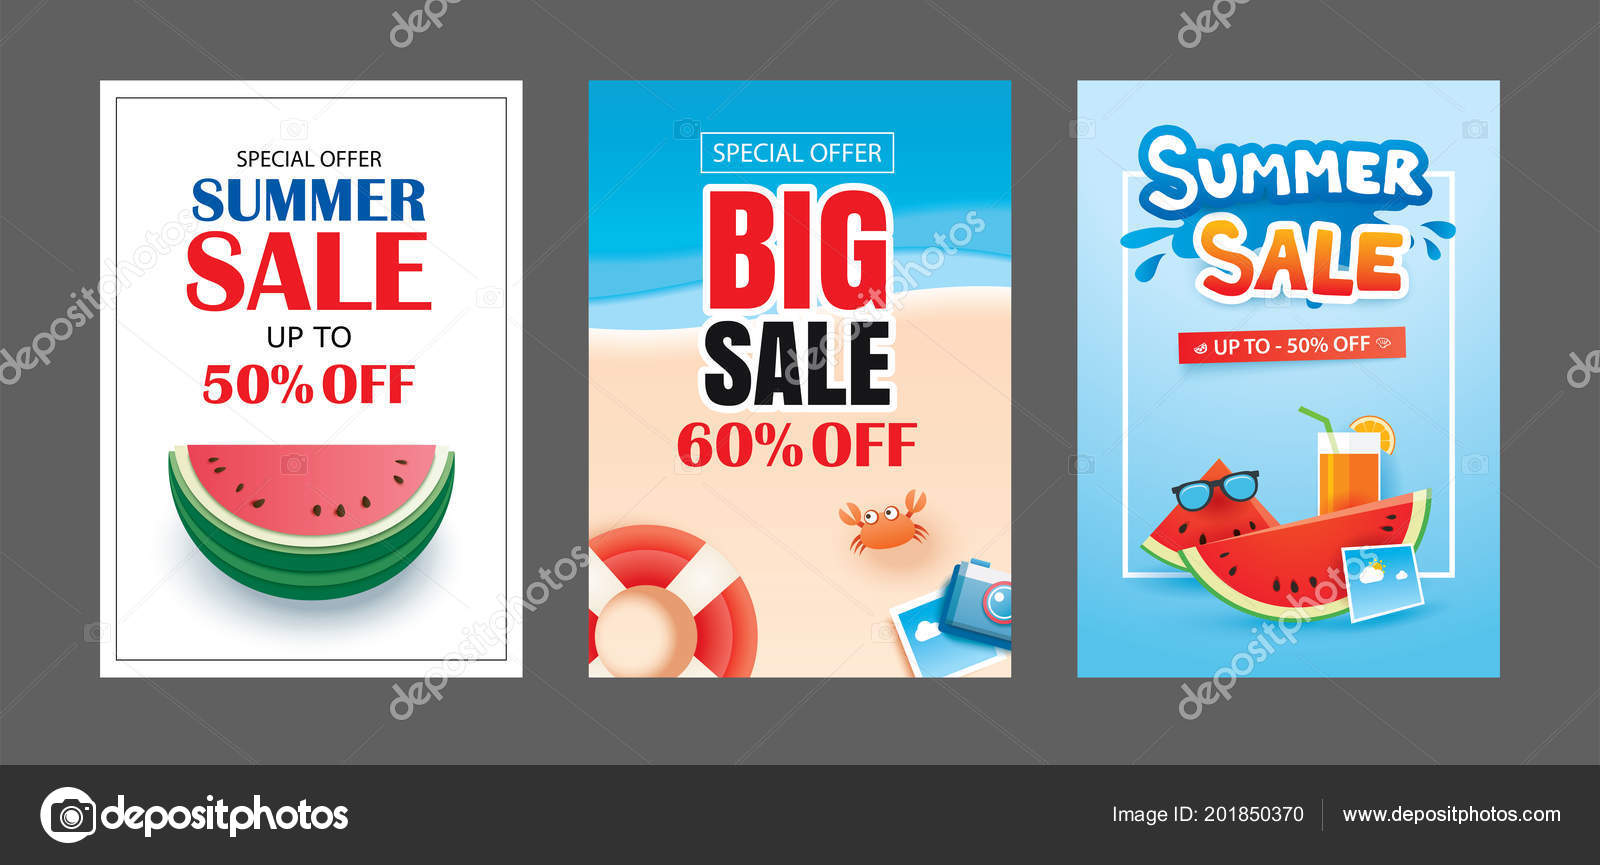 https://st4.depositphotos.com/2404187/20185/v/1600/depositphotos_201850370-stock-illustration-summer-sale-banner-templates-paper.jpg